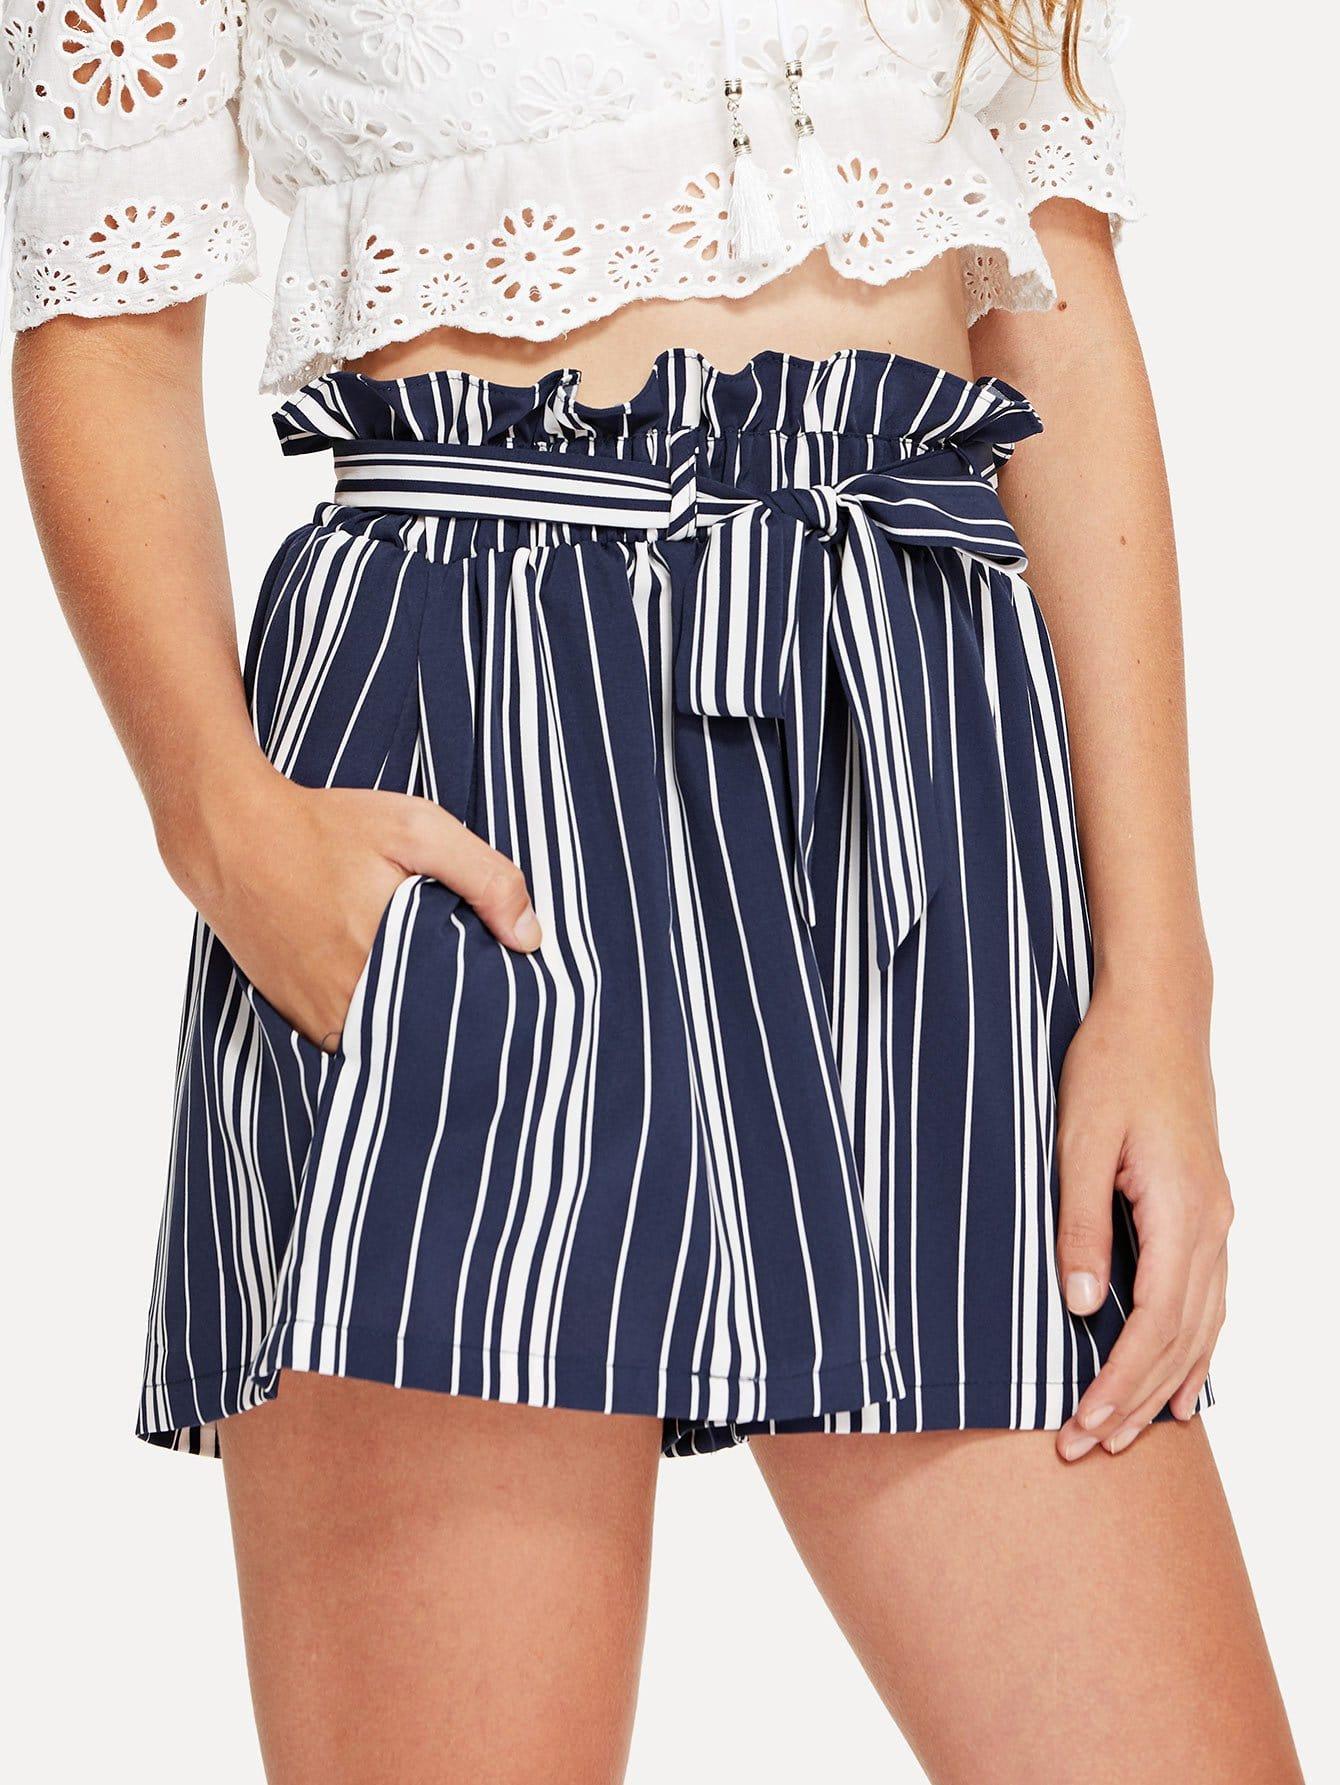 Tie Waist Striped Shorts striped ruffled waist self tie pants